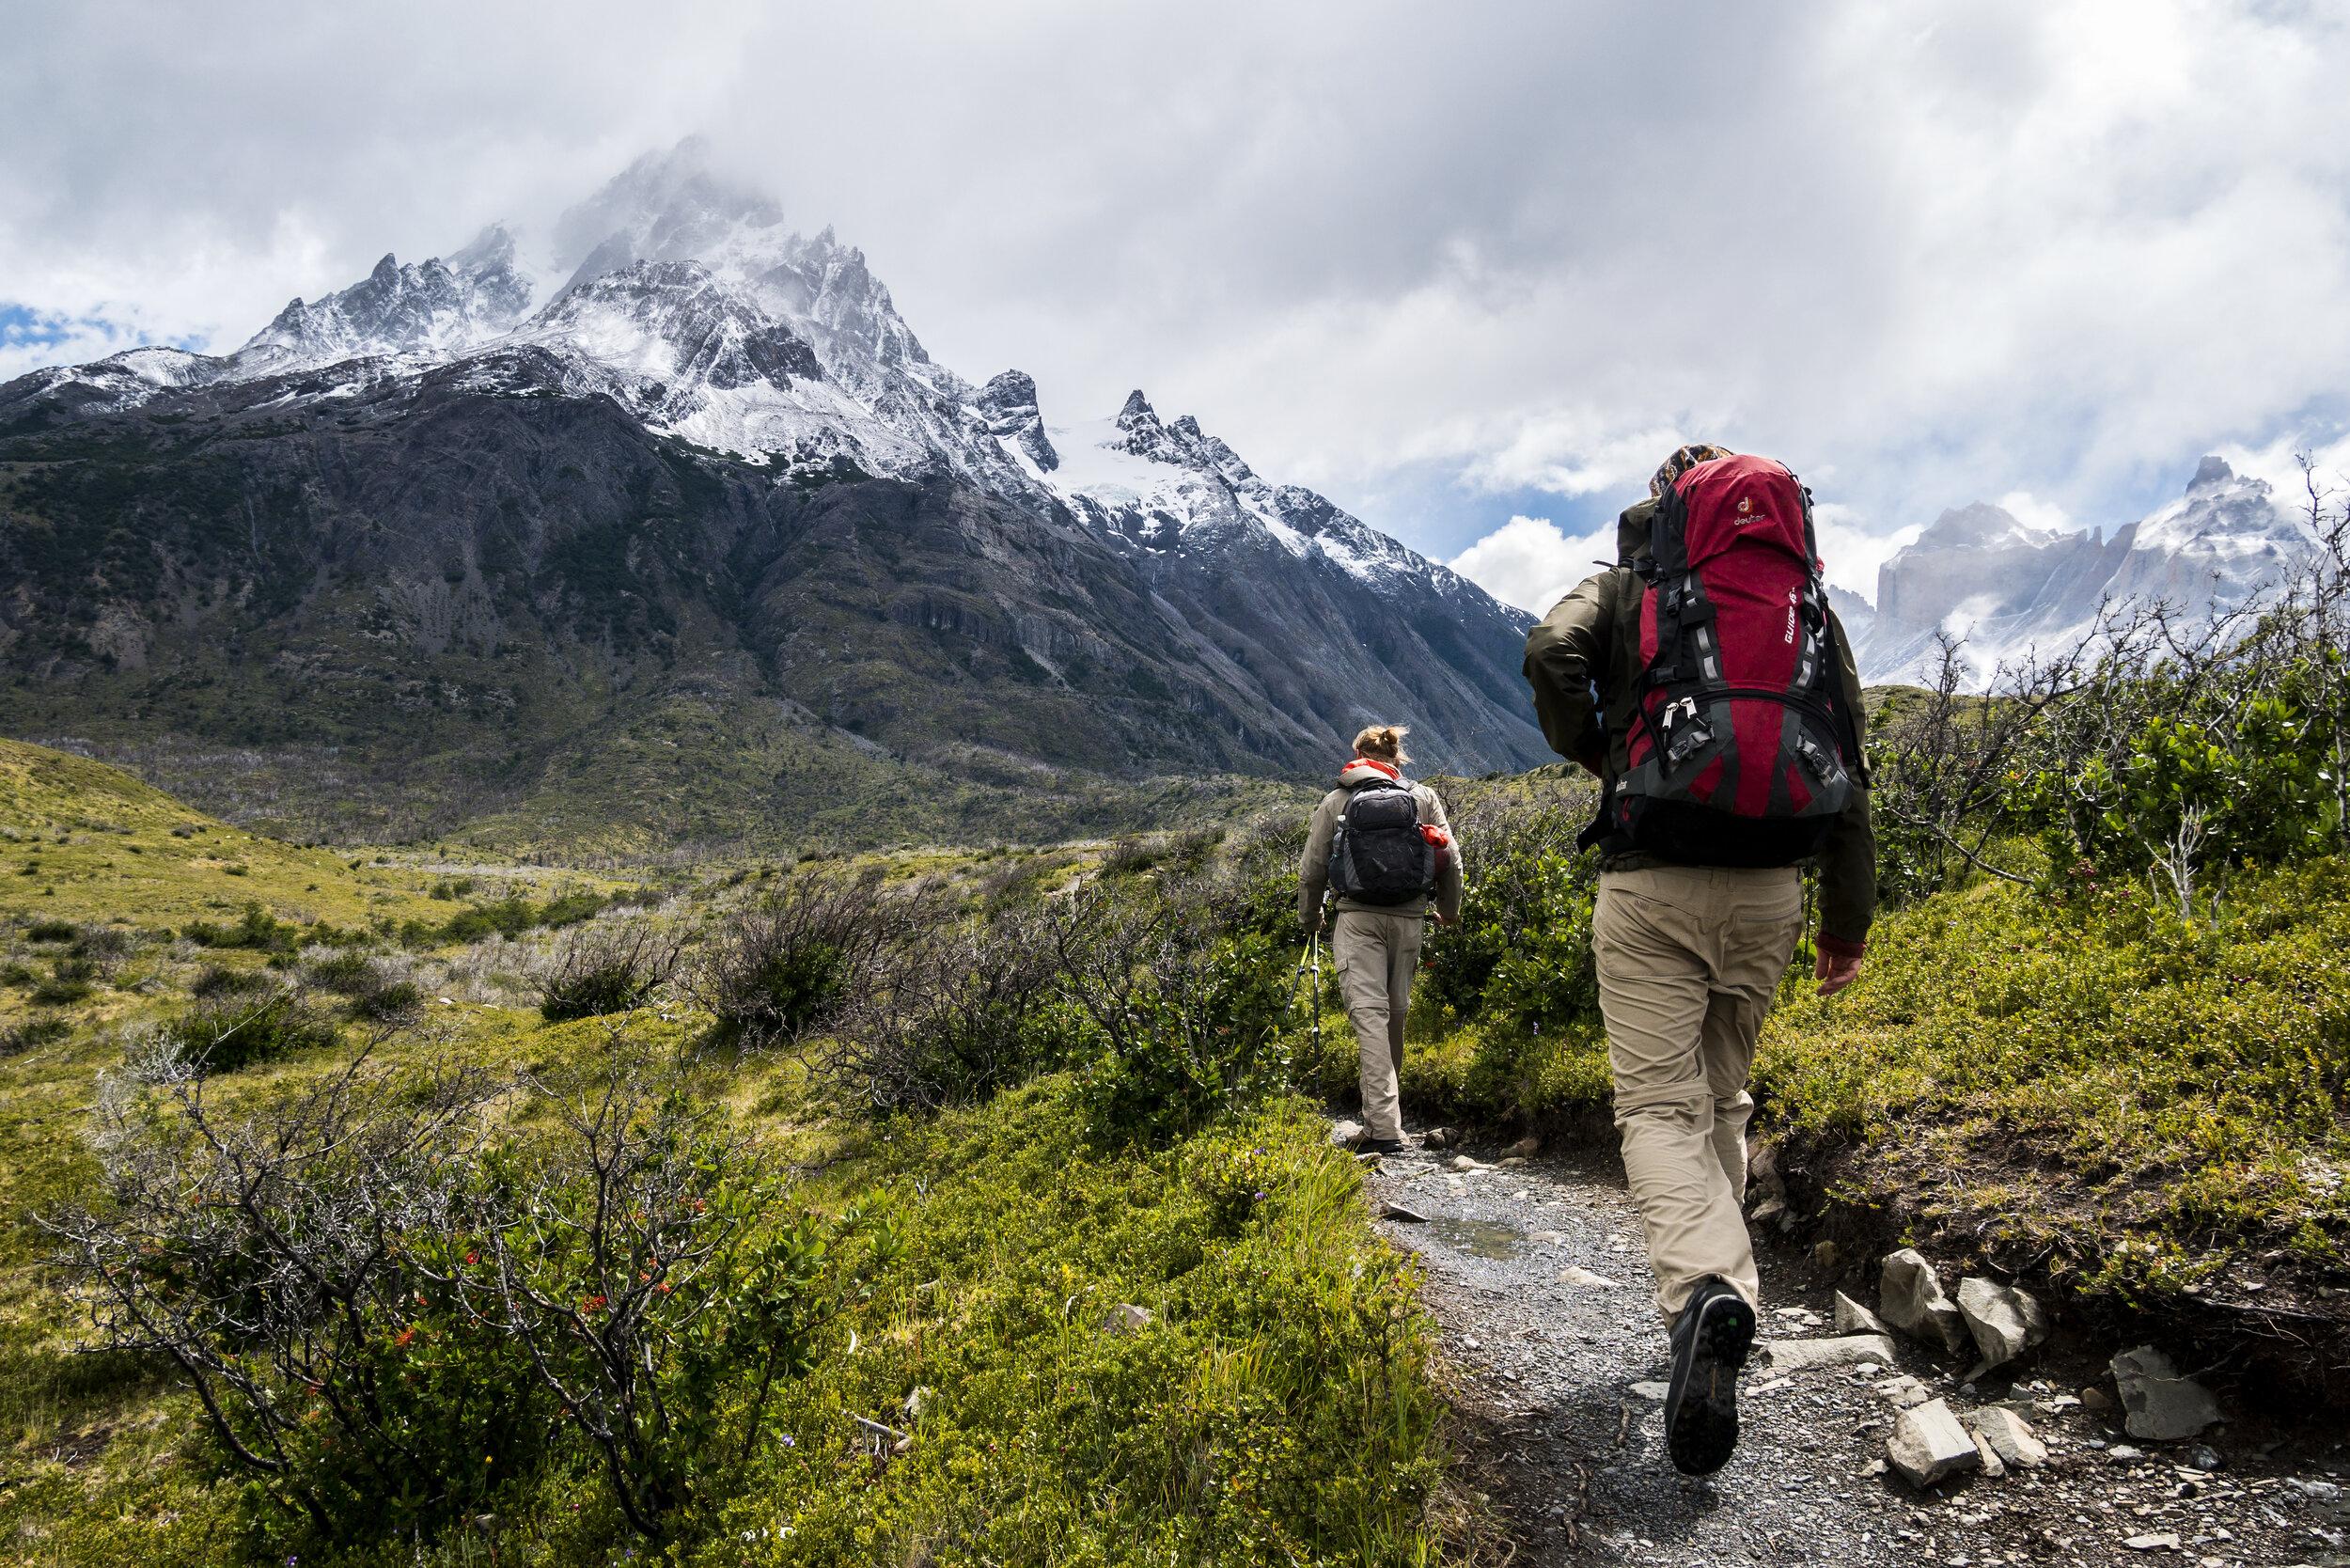 Day Hiking - Location: BoulderPrice: $20/personGroup Minimum/Maximum: 4/12